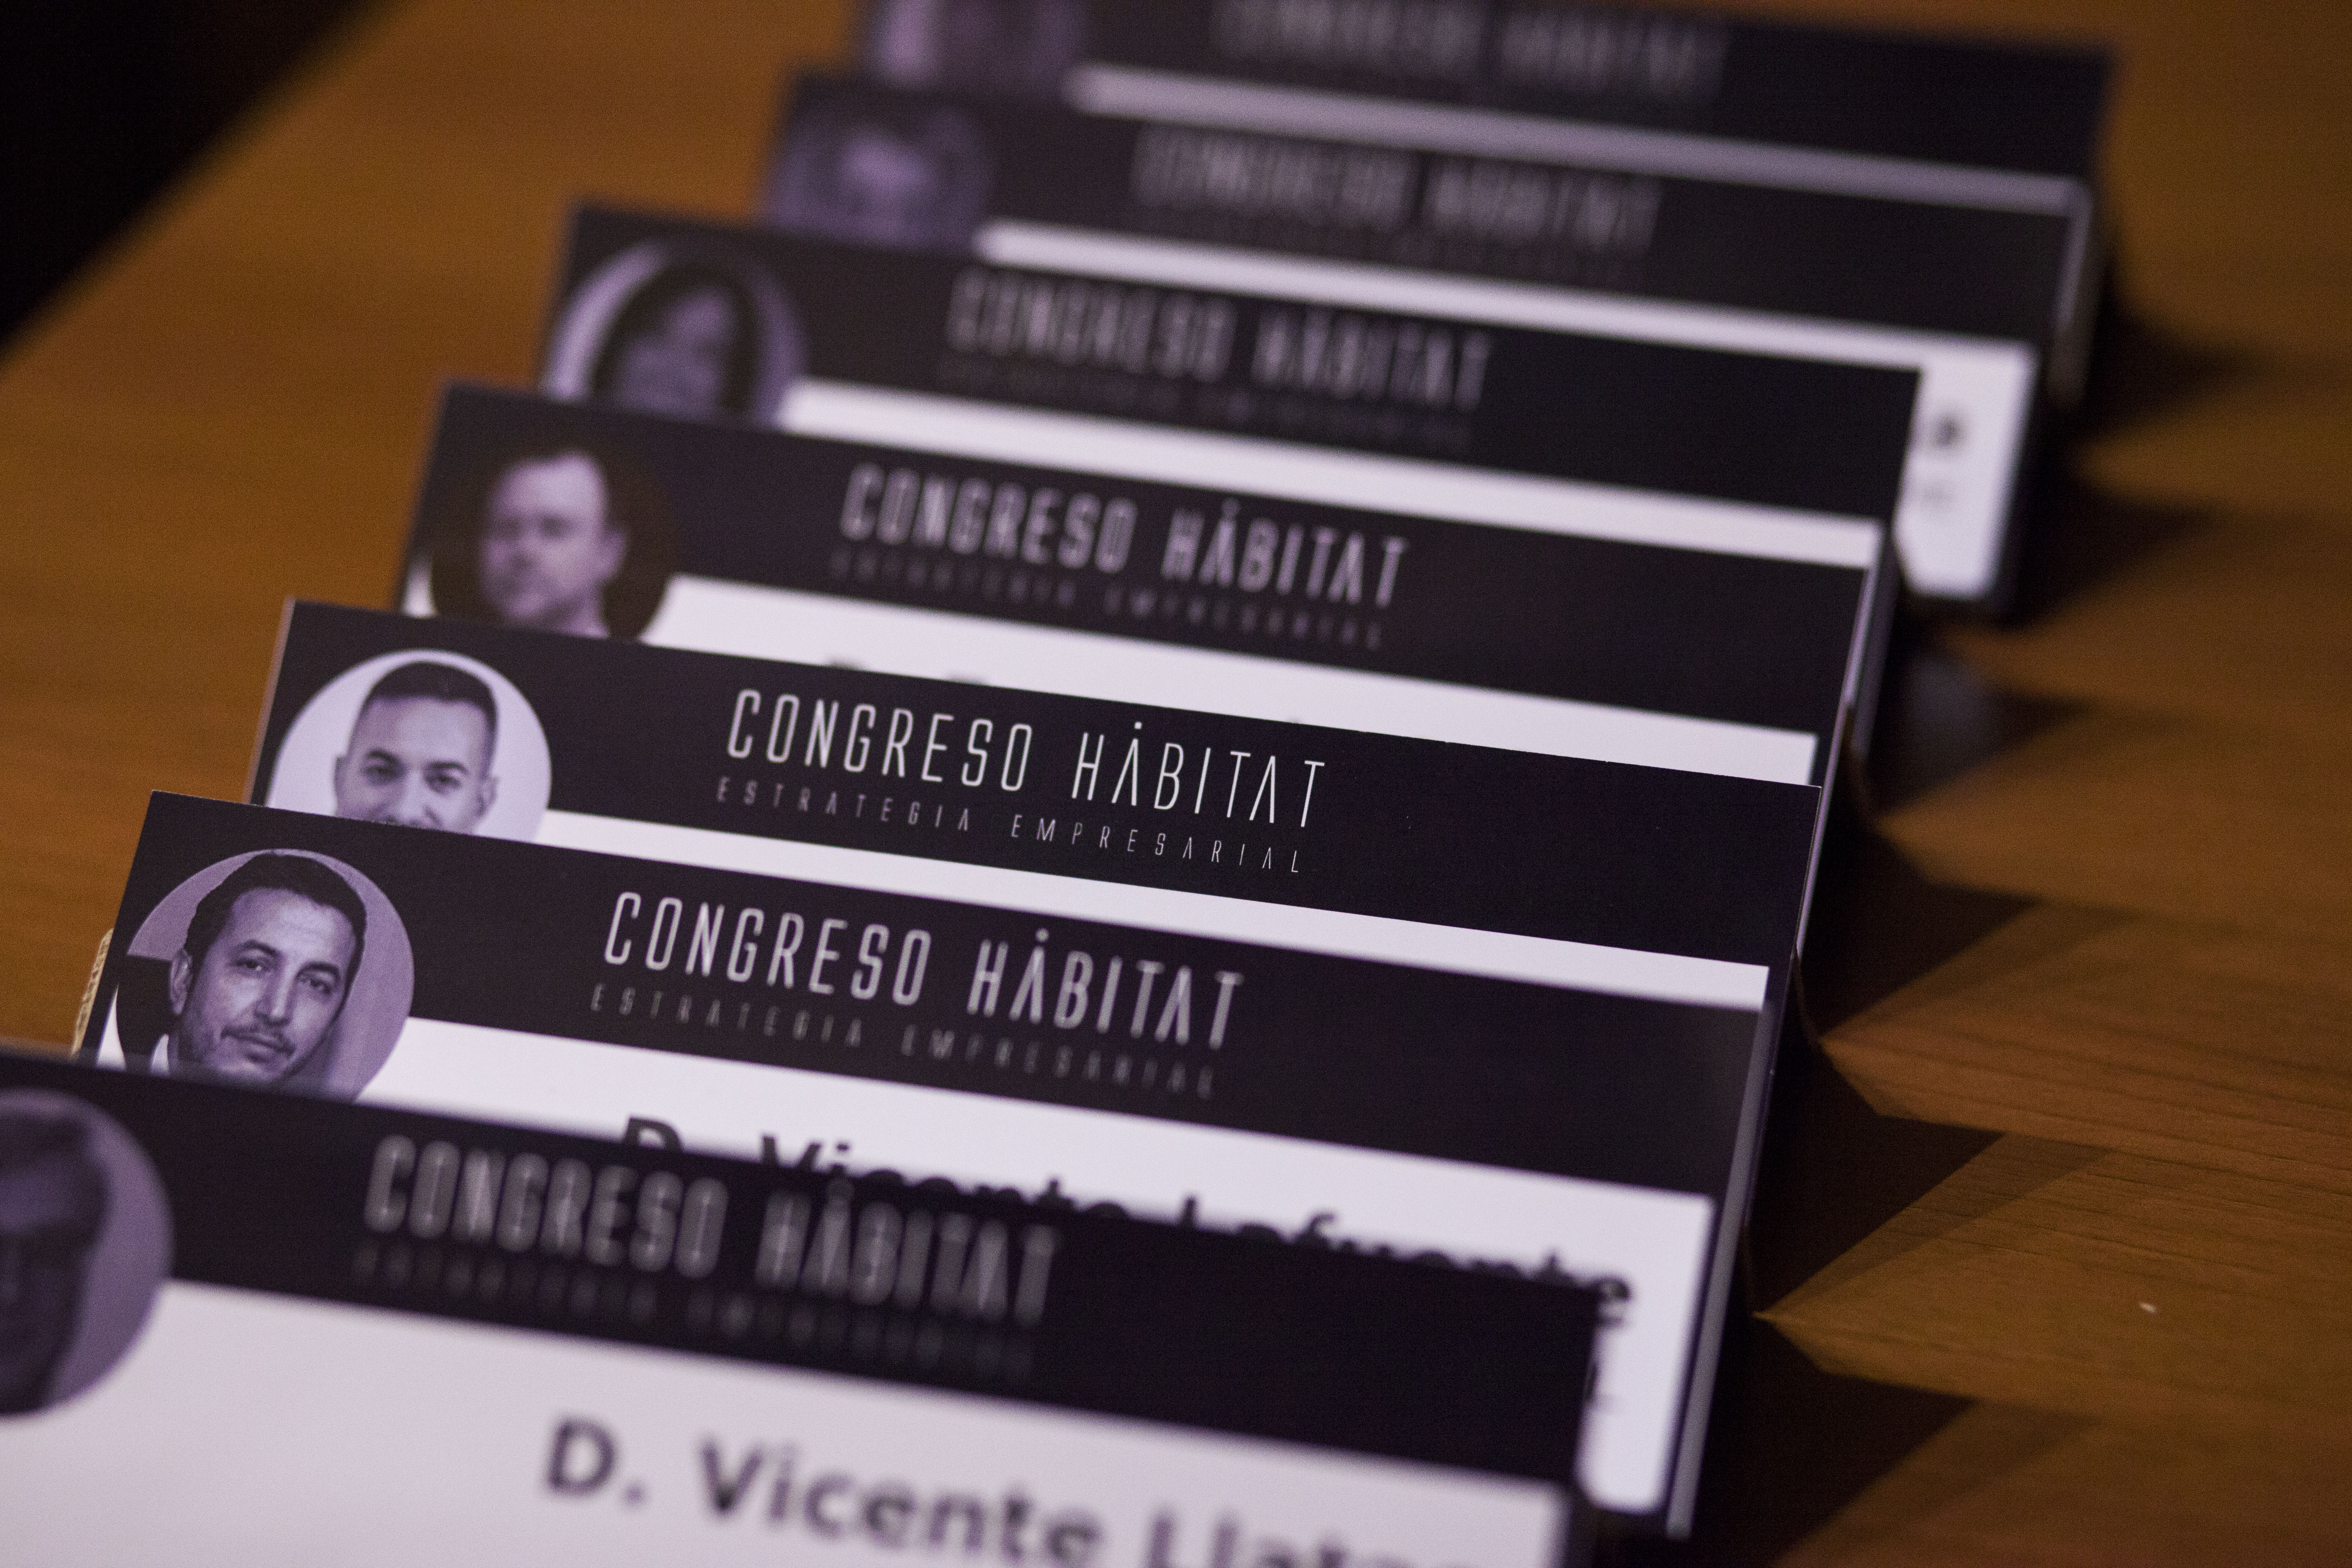 CONGRESO-HABITAT-201